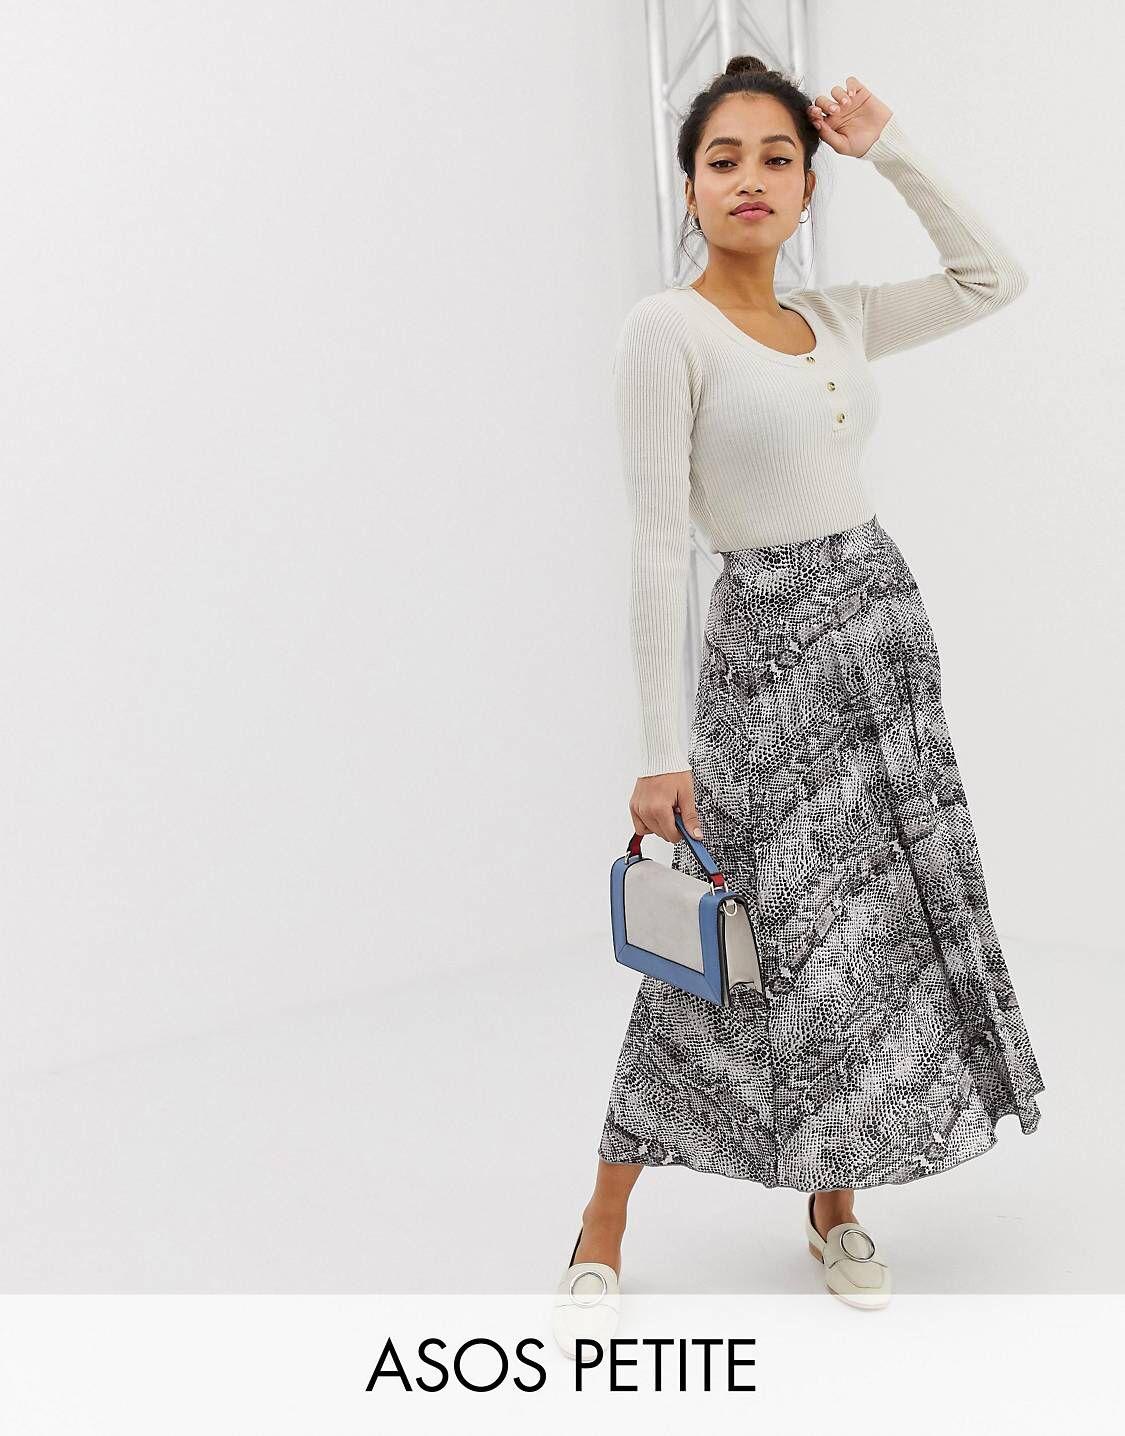 244d9f5ba7 Pleated Midi Skirt · Snake Print · Petite Fashion · Petite Tops, Asos  Petite, Petite Jeans, Petite Style, Petite Outfits, Petite